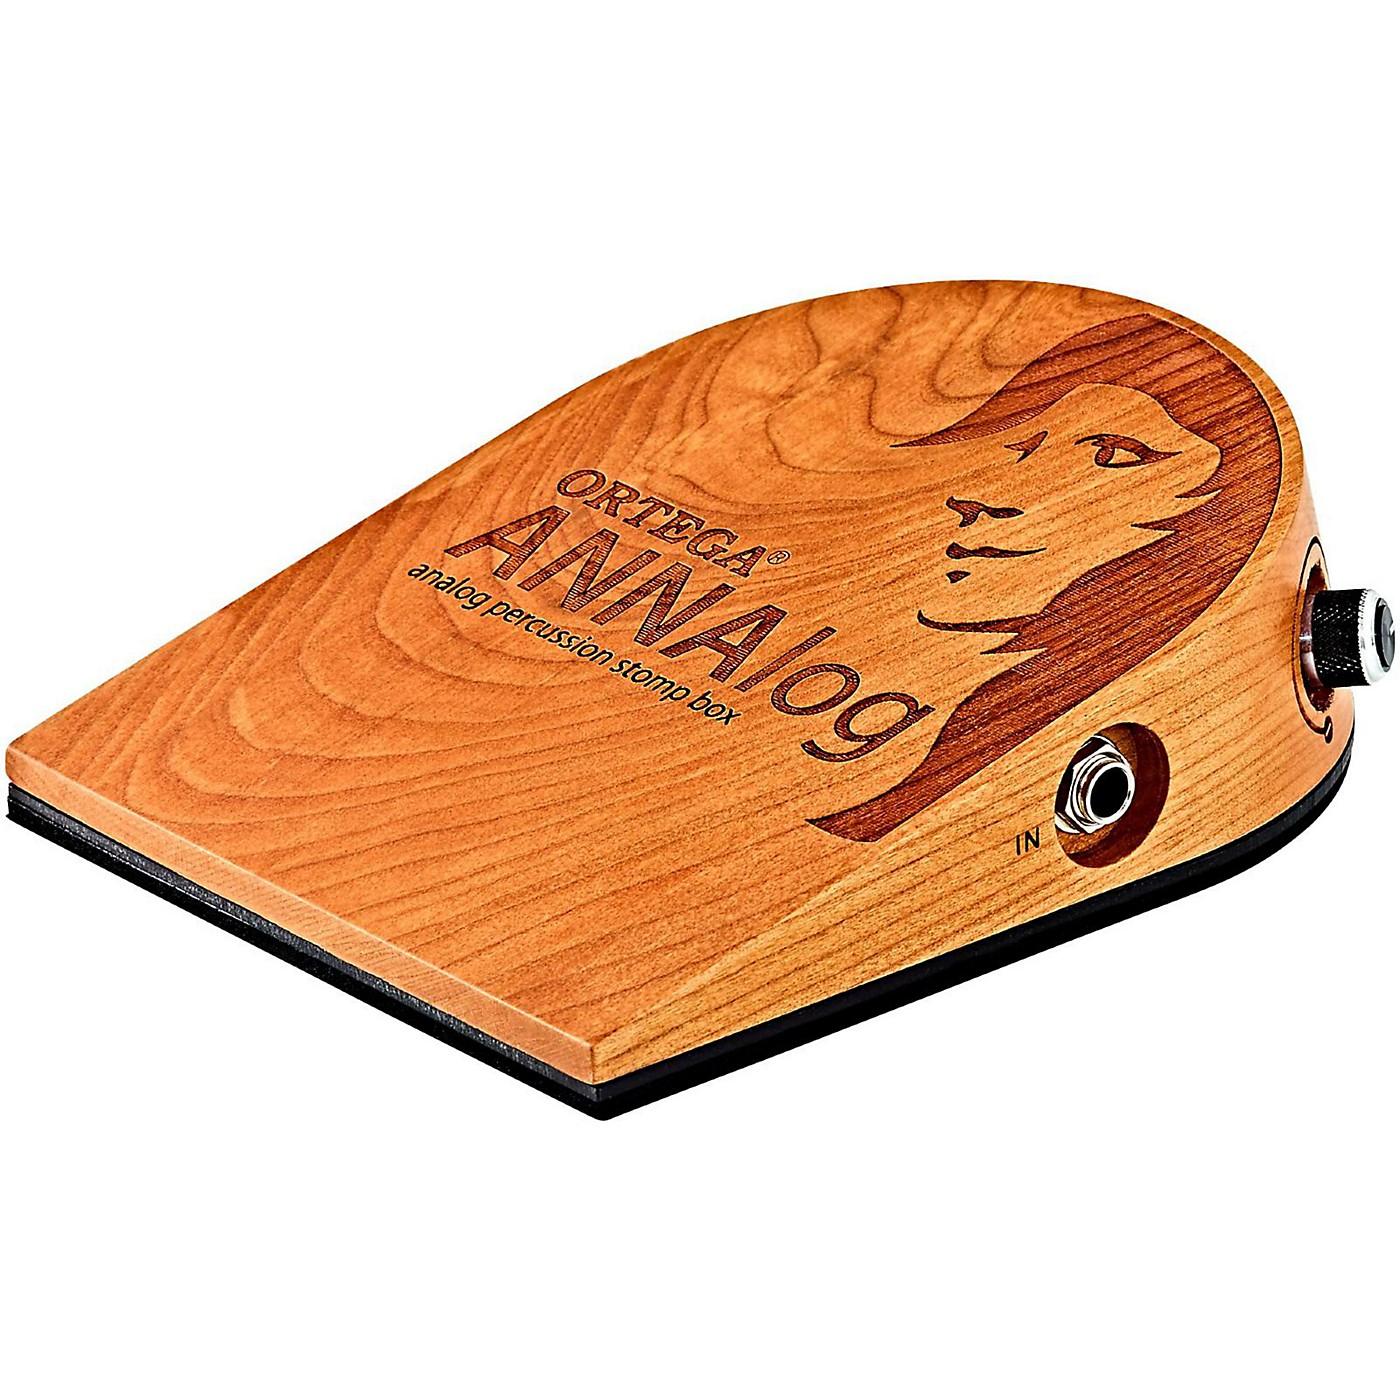 Ortega Analog Stomp Box with Built-In Sound Optimized Piezo Technology thumbnail